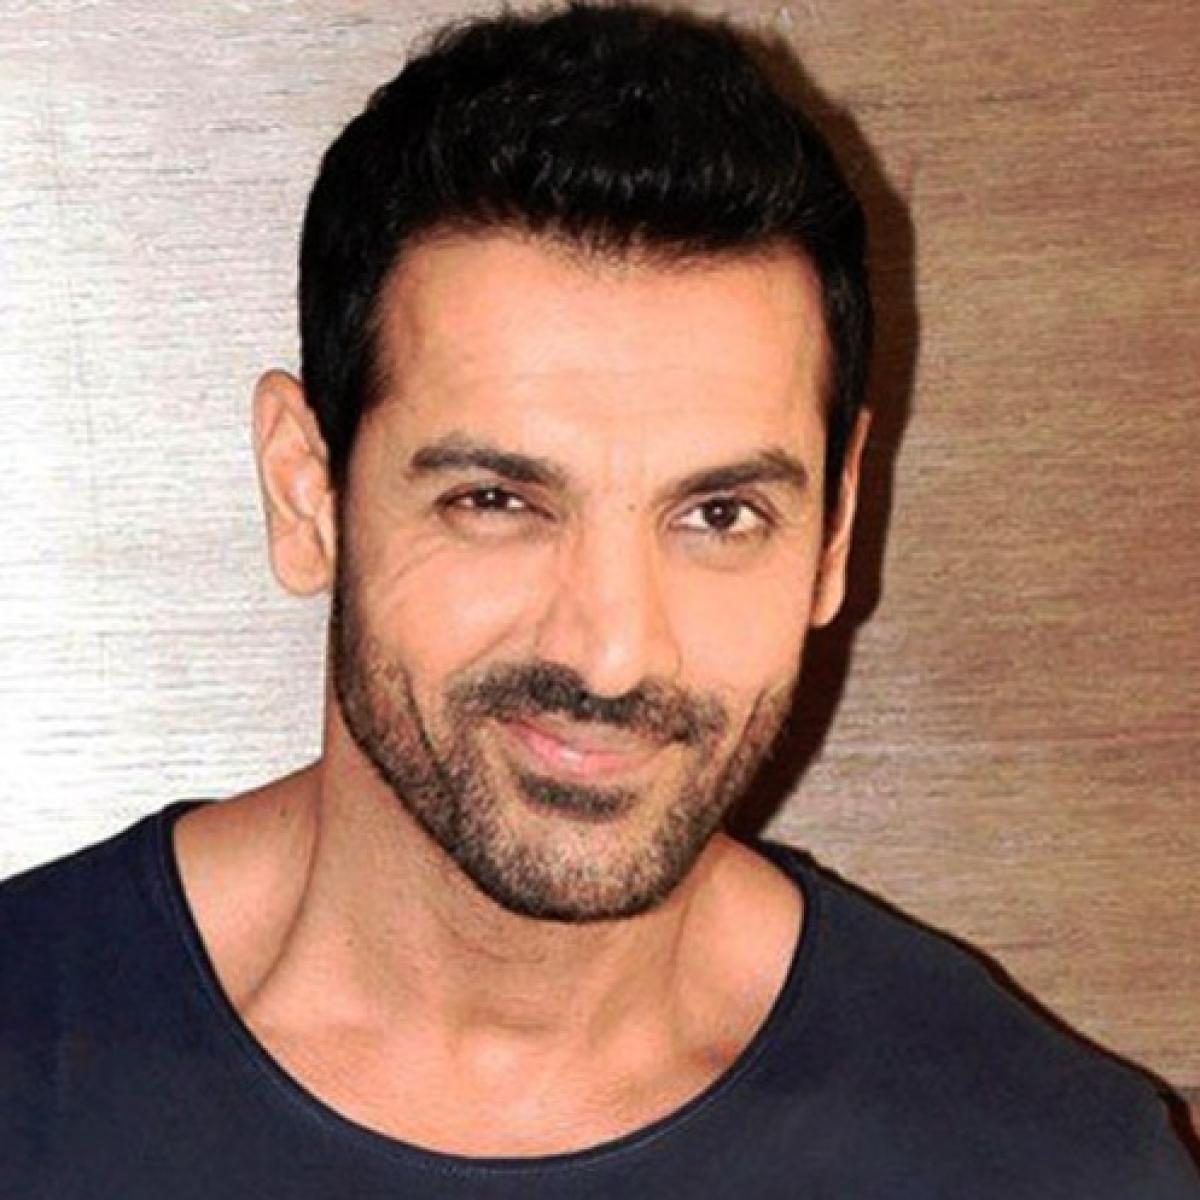 John Abraham to have a triple role in 'Satyameva Jayate 2'? Actor clarifies